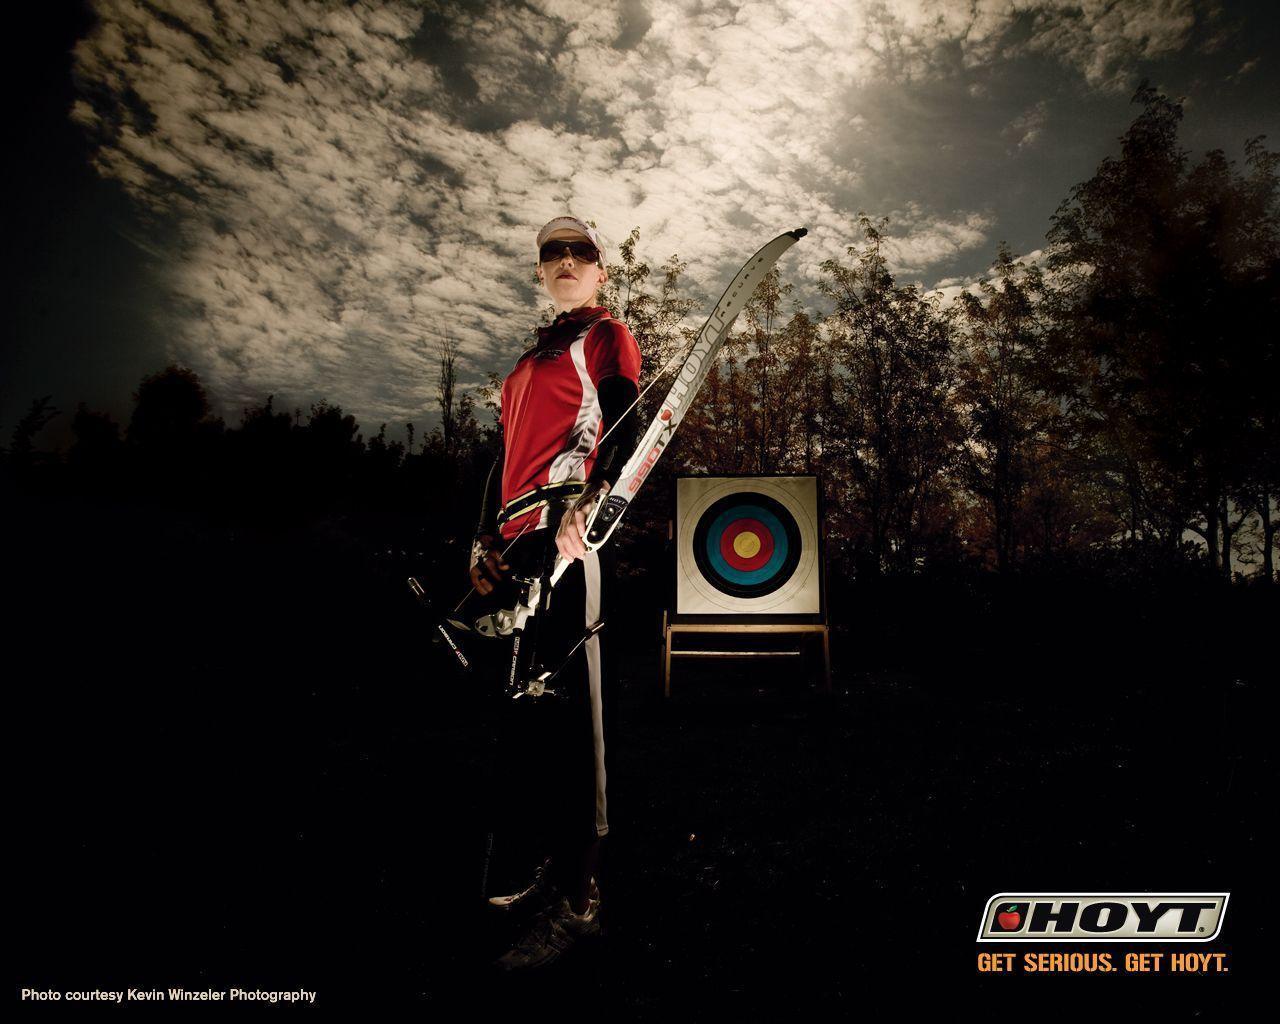 archery wallpaper desktop - photo #22